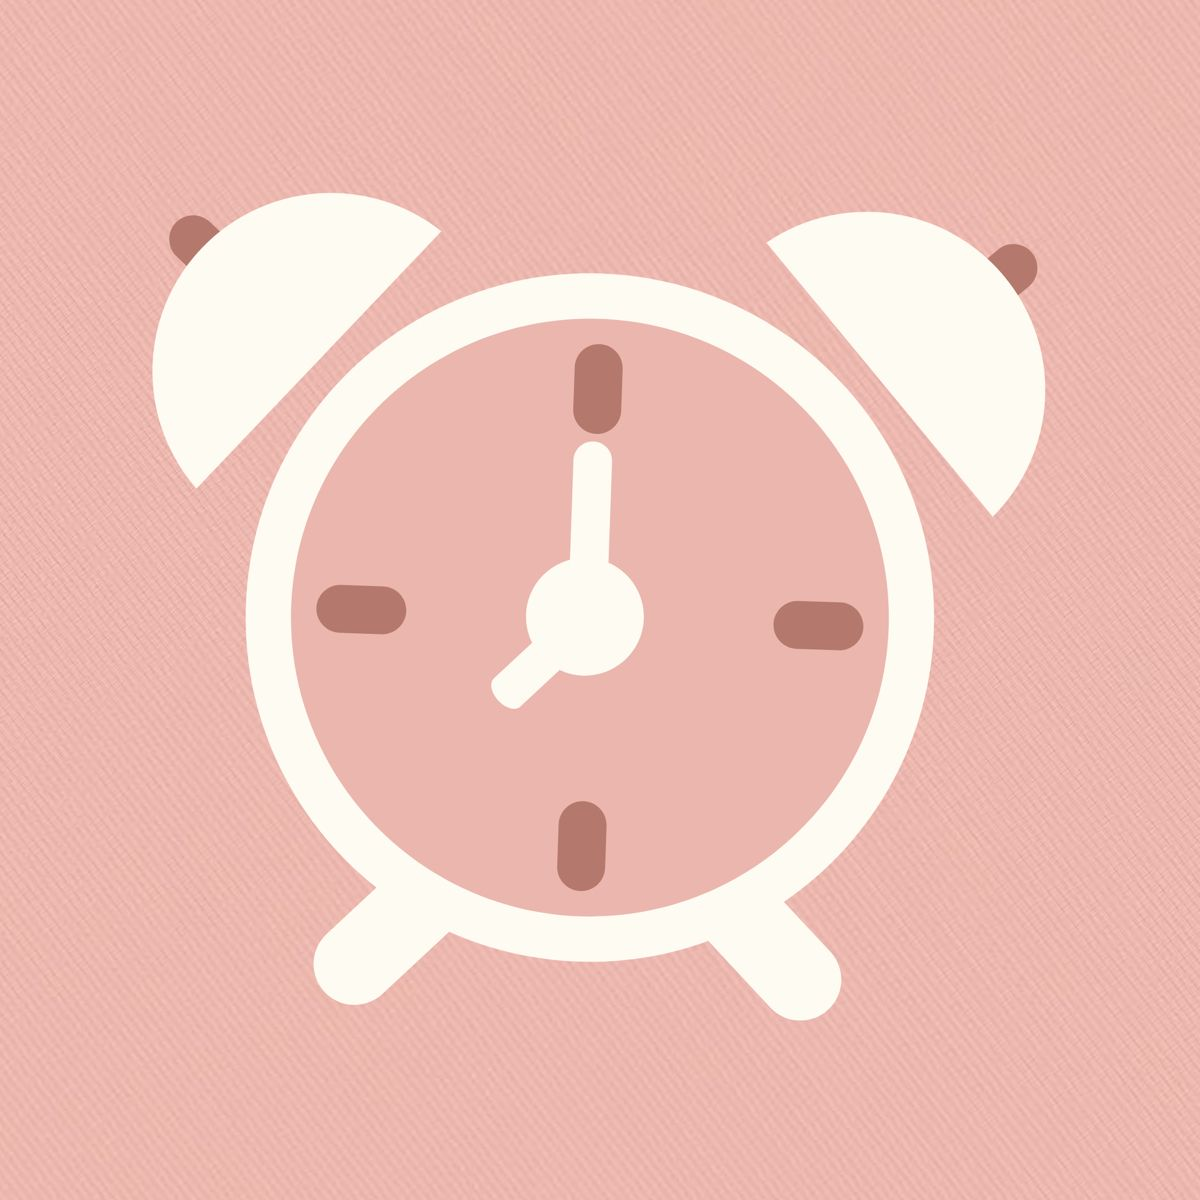 Clock App Icon In 2020 Cute App Iphone Icon Ios App Icon